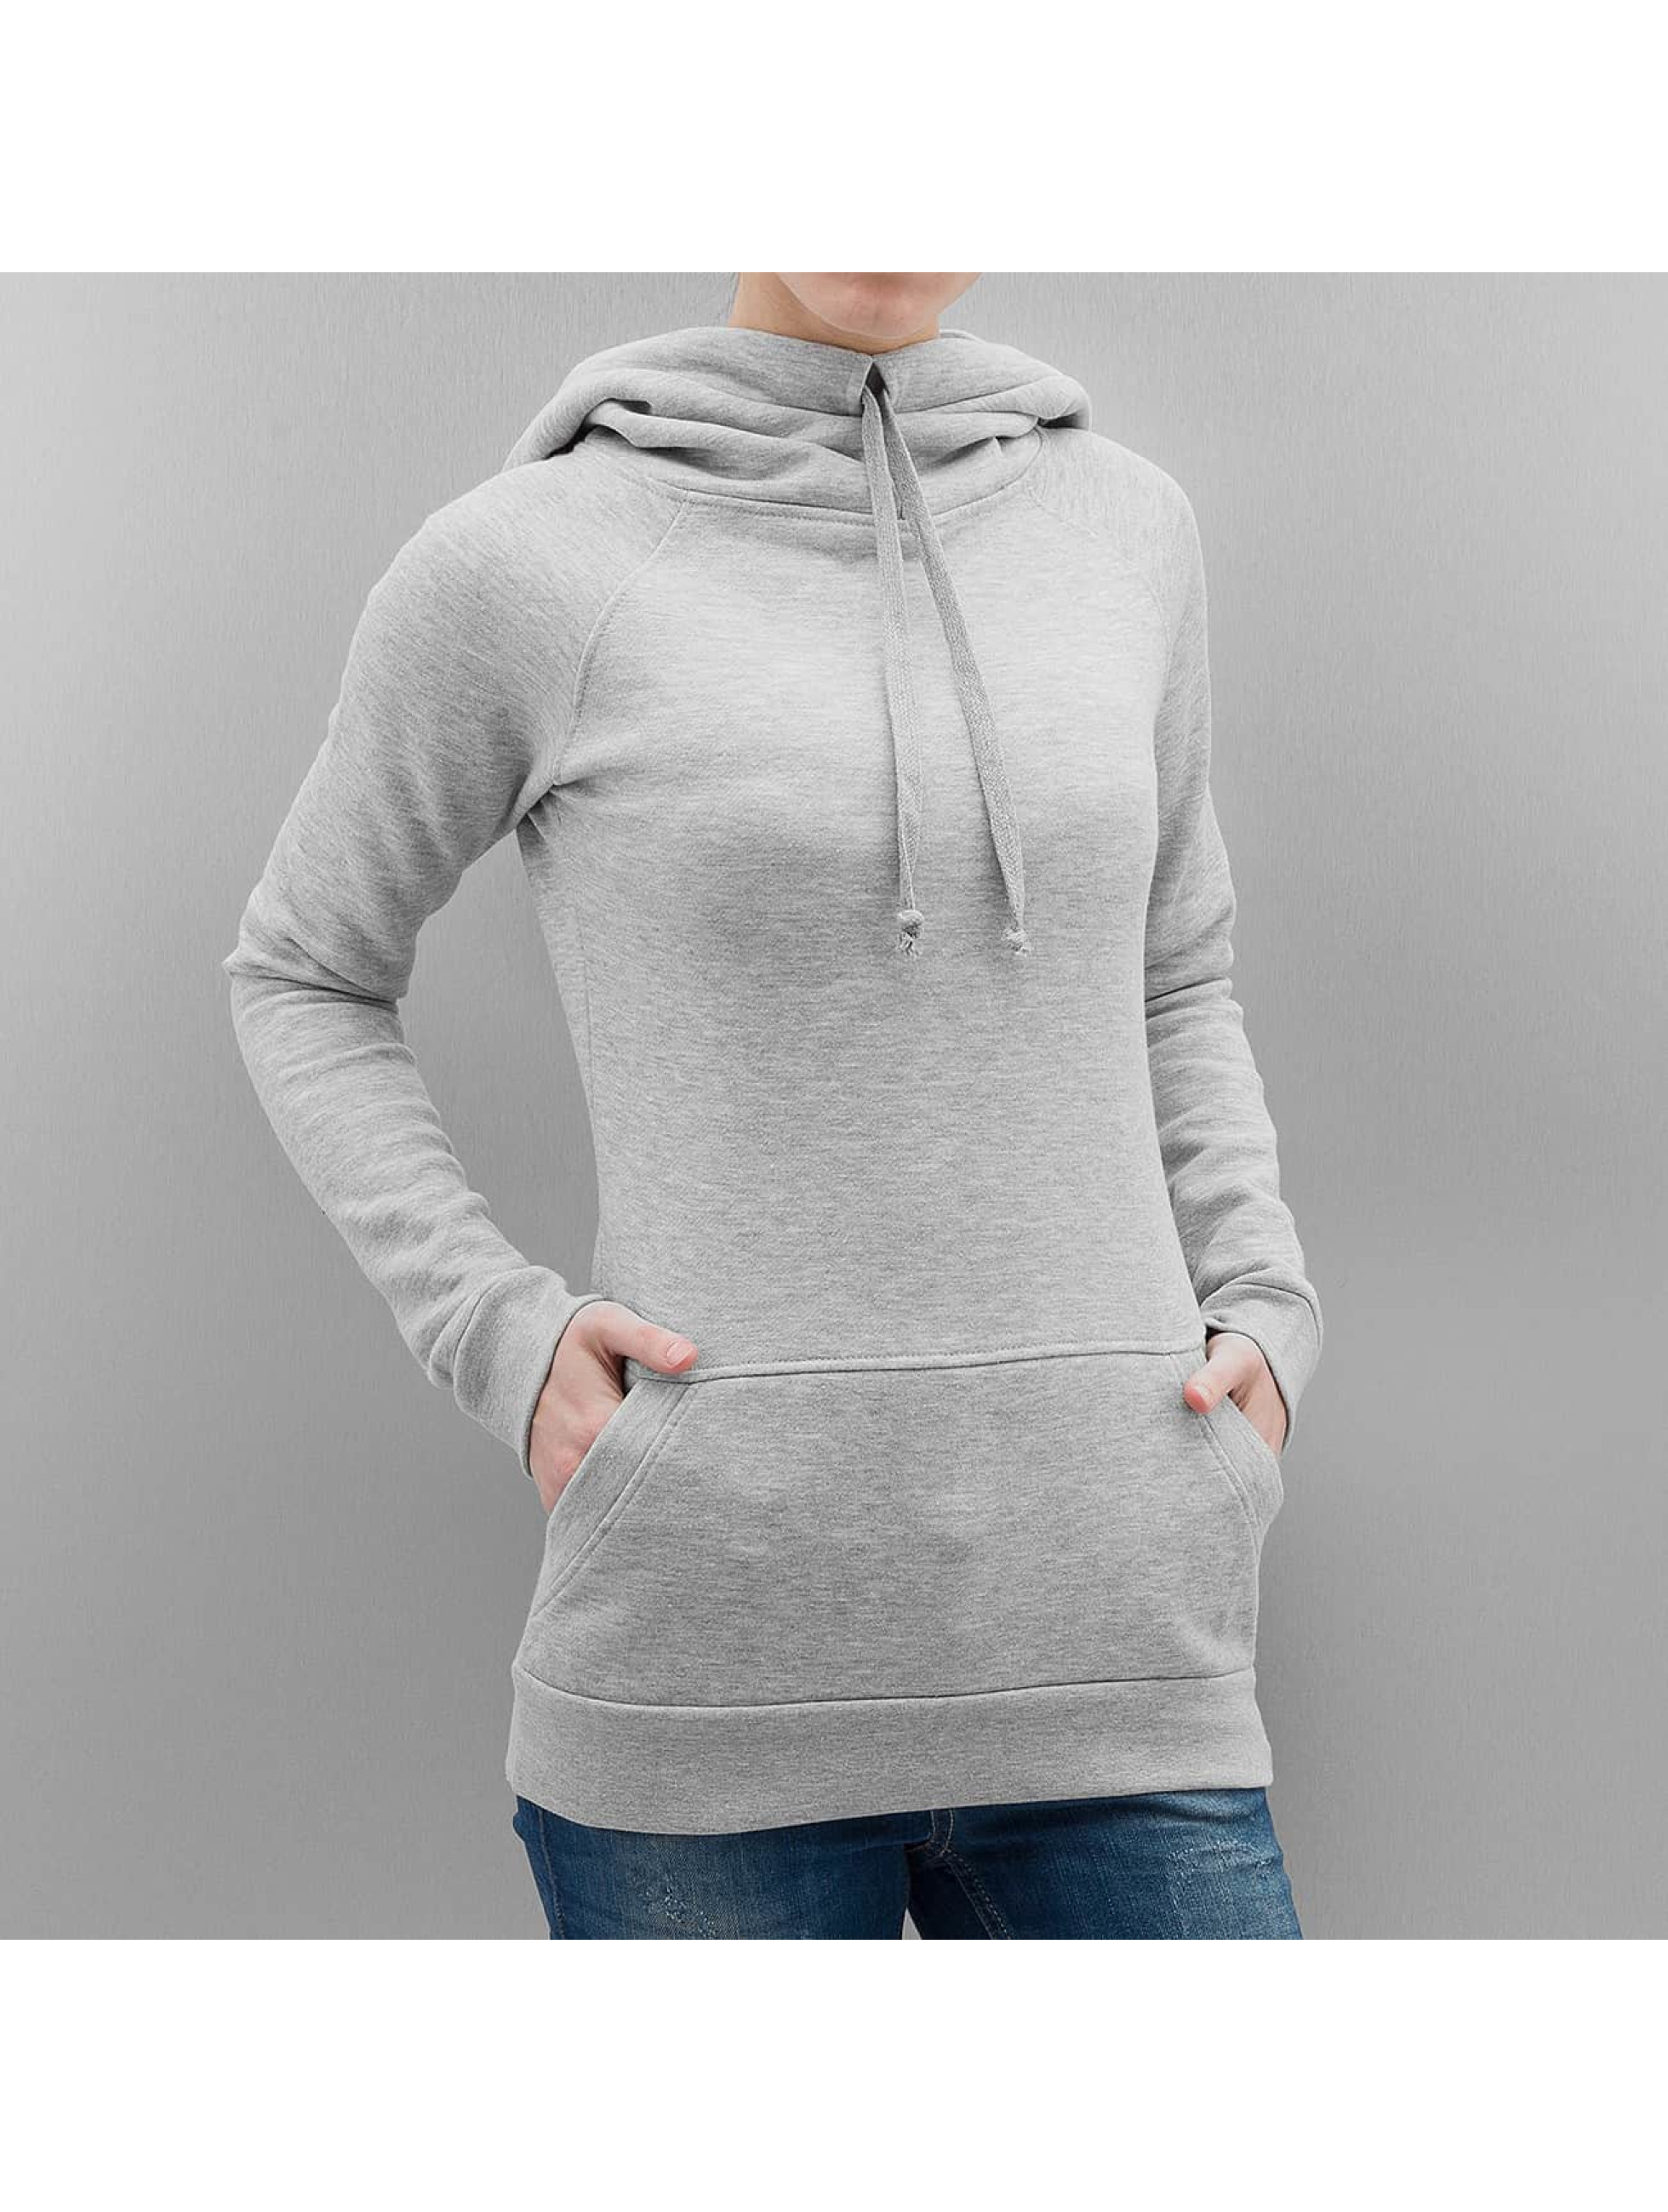 Urban Classics Hoodie Ladies High Neck grey